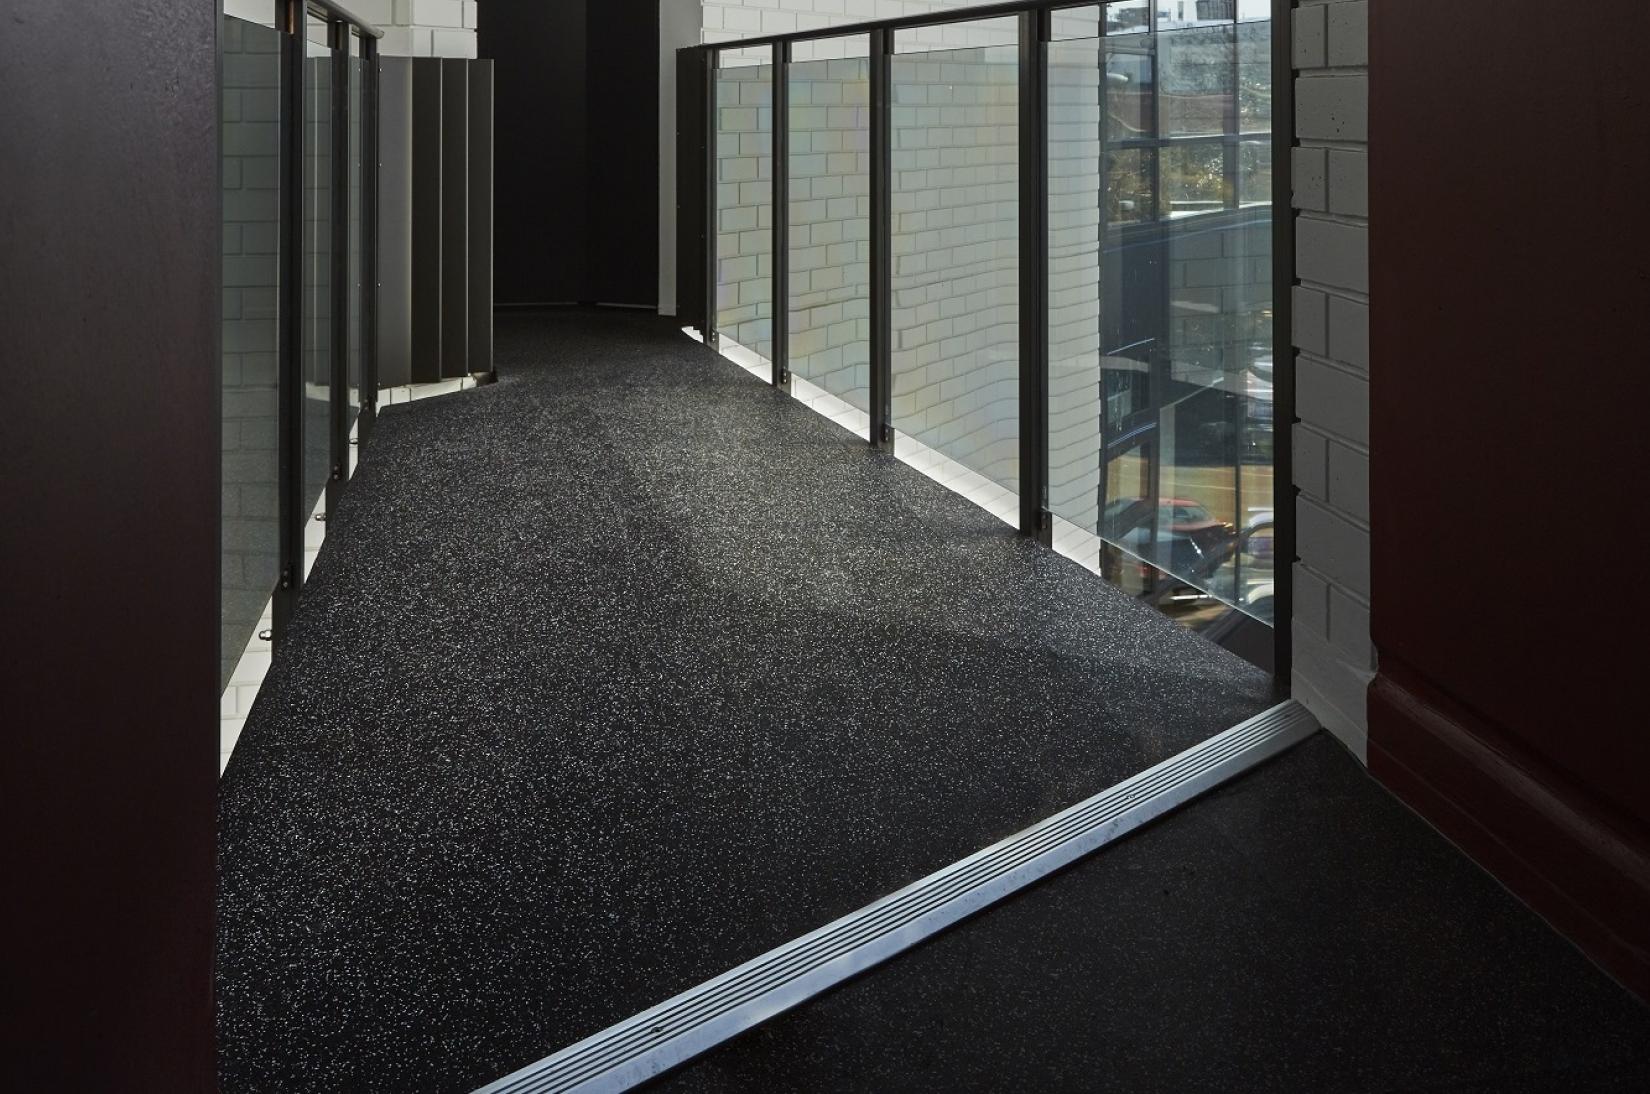 Rubber Flooring - Acoustic Damping Multi Storey